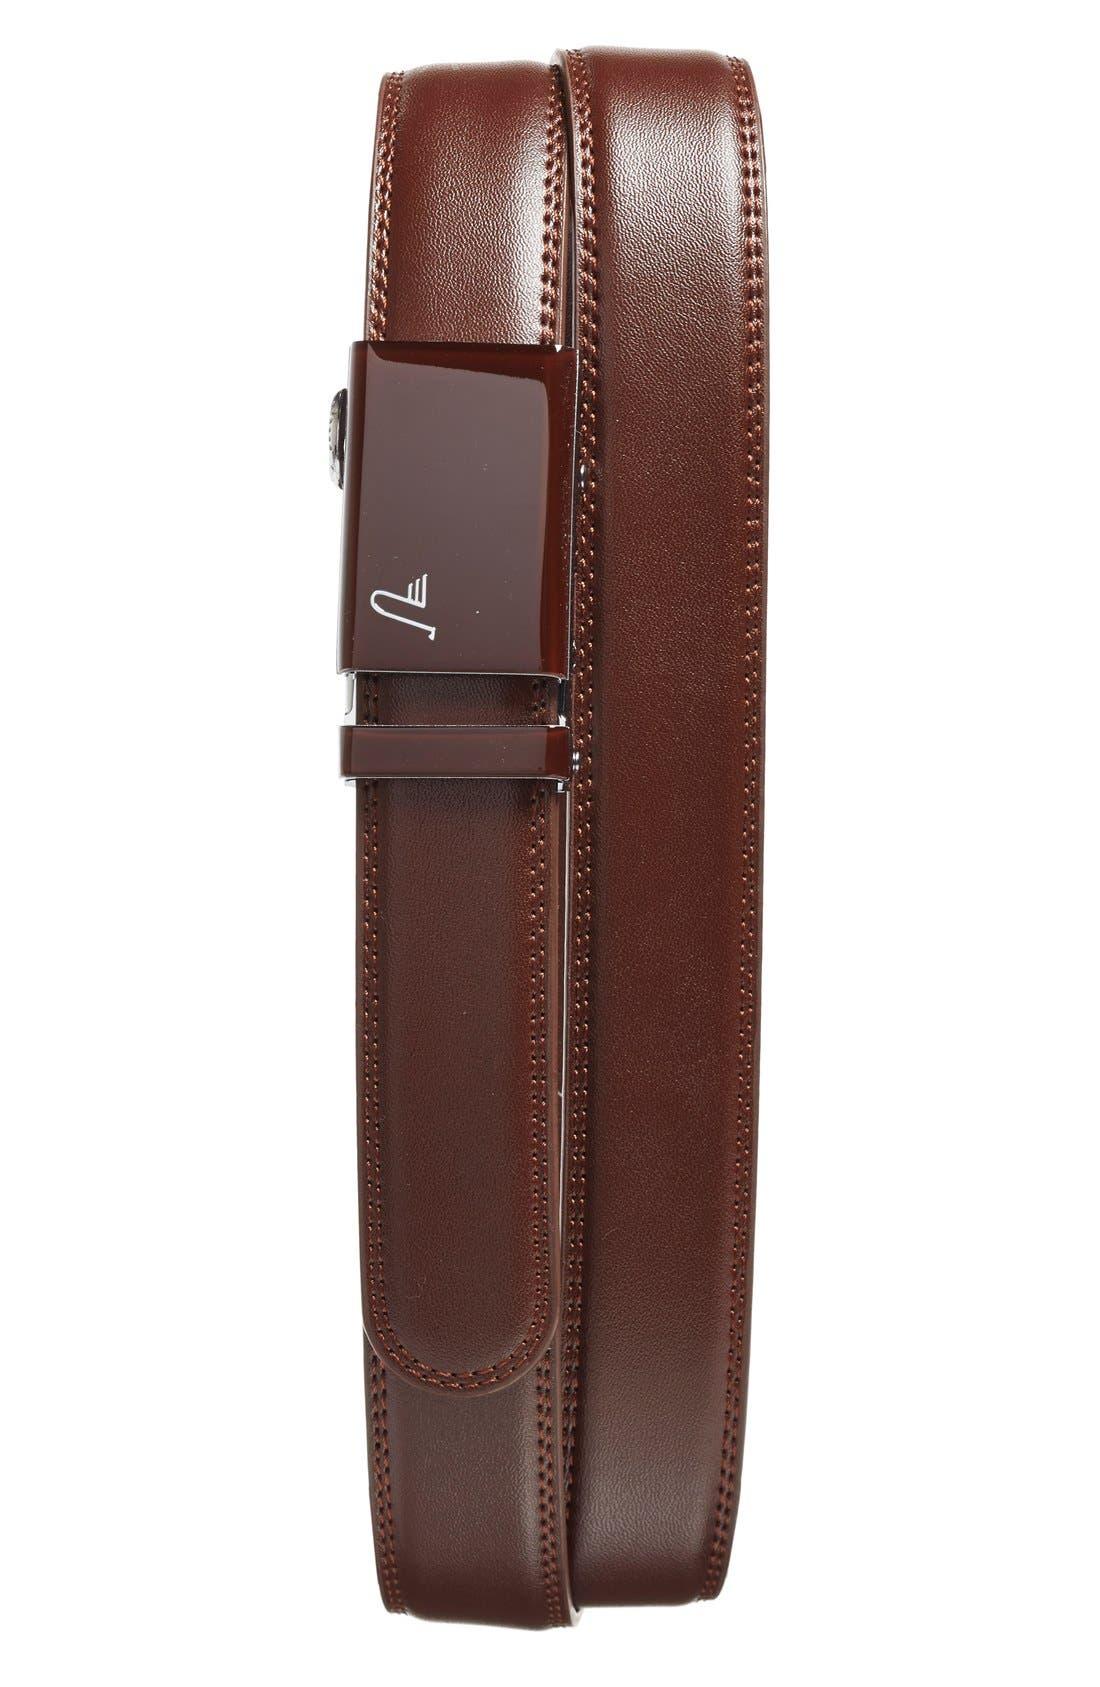 Main Image - Mission Belt 'Chocolate' Leather Belt